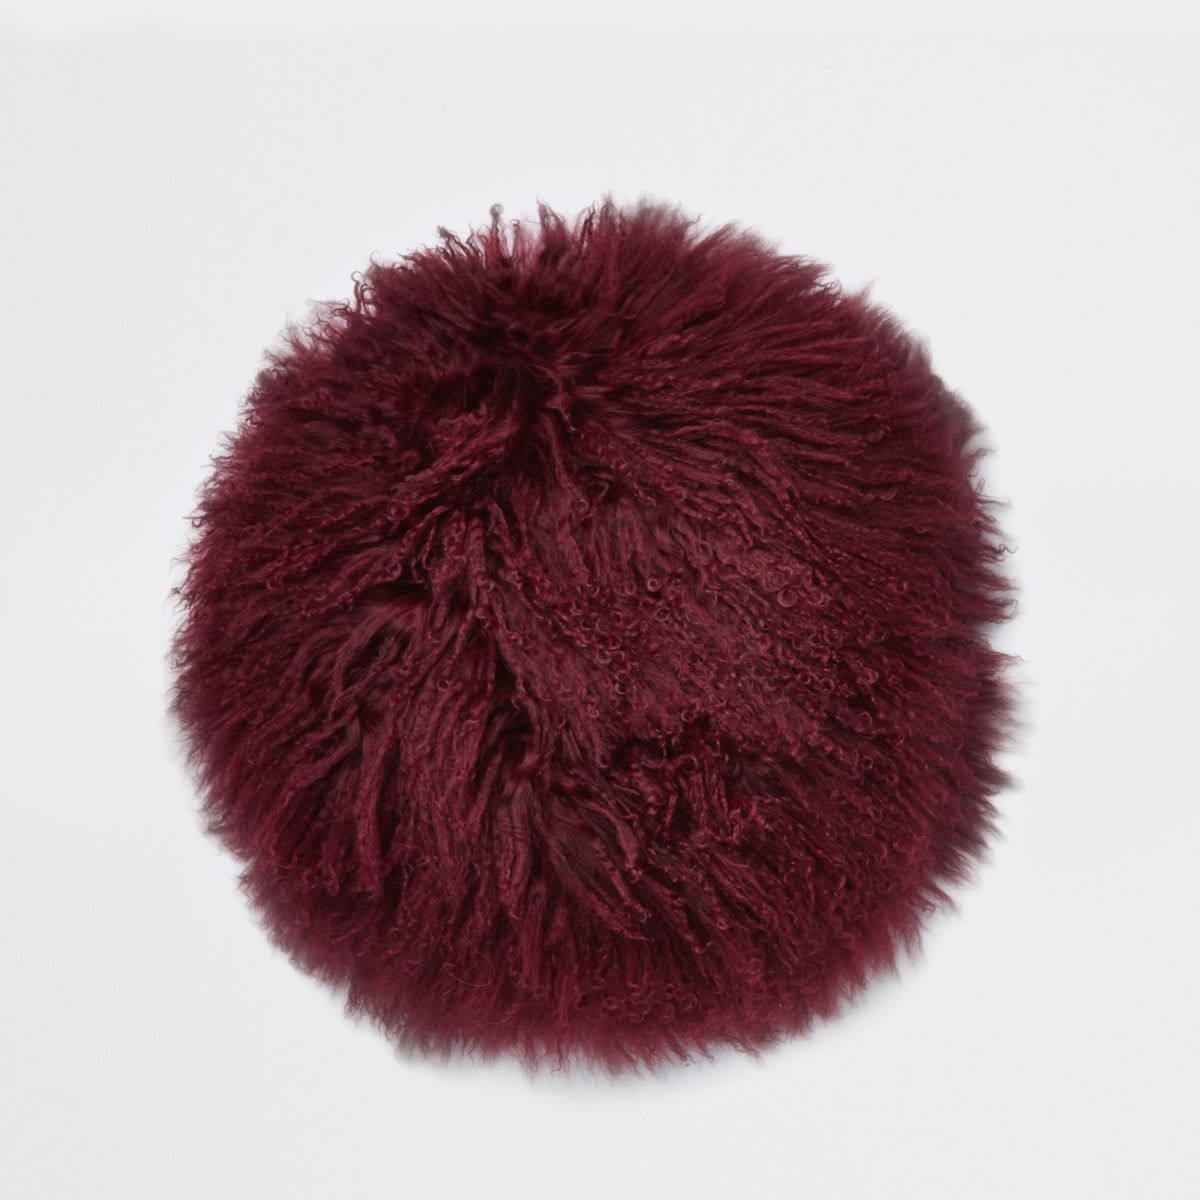 Burgundy Mongolian round cushion